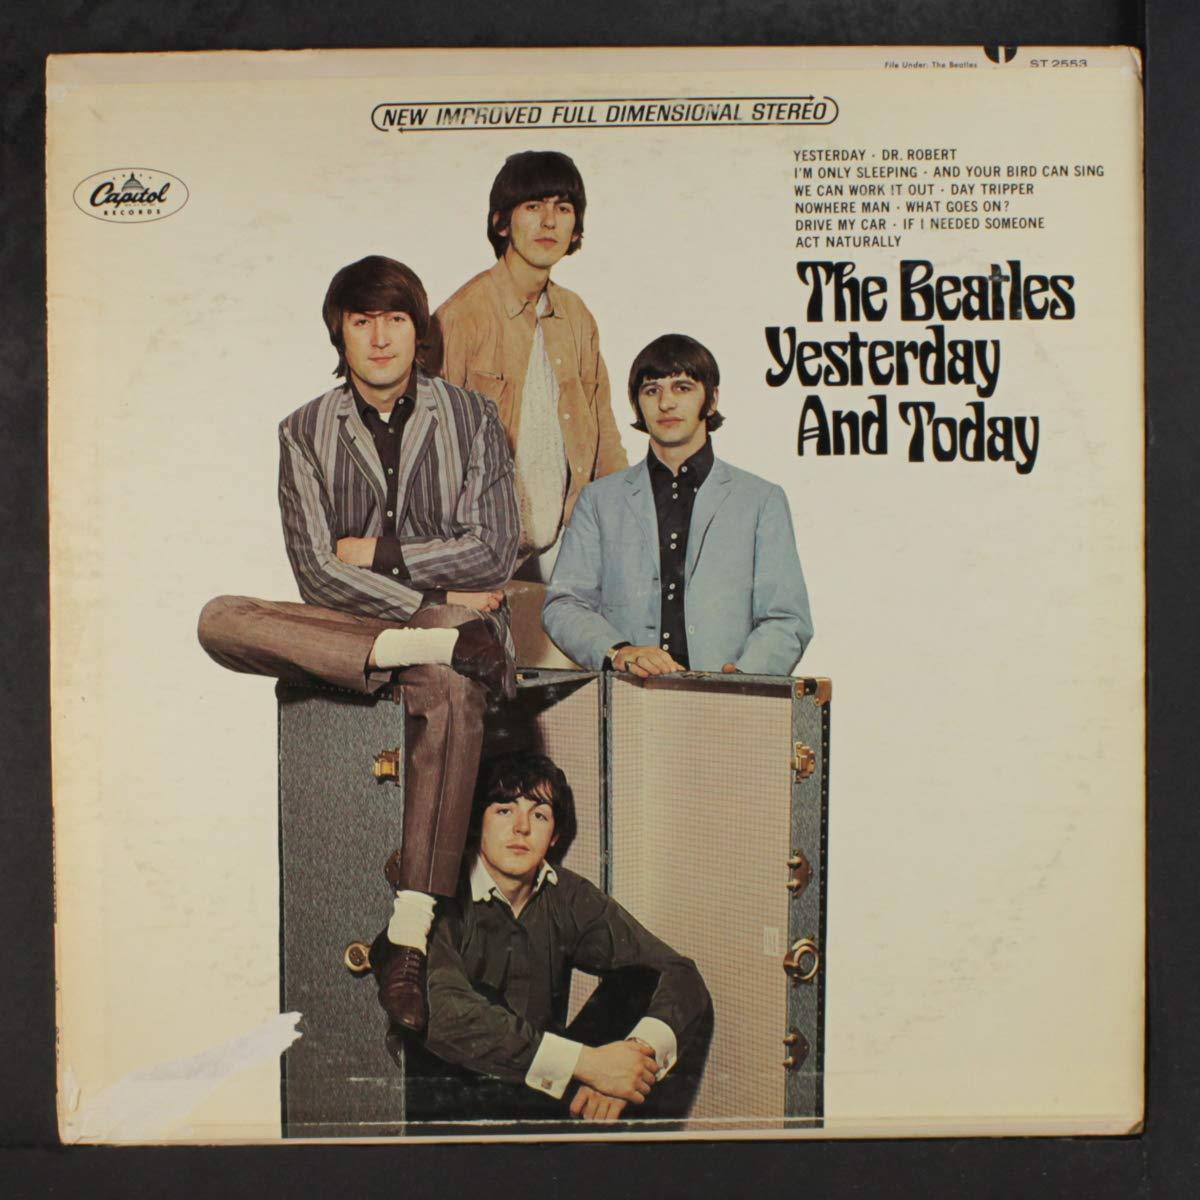 Beatles - Yesterday...and Today [Vinyl] - Amazon.com Music